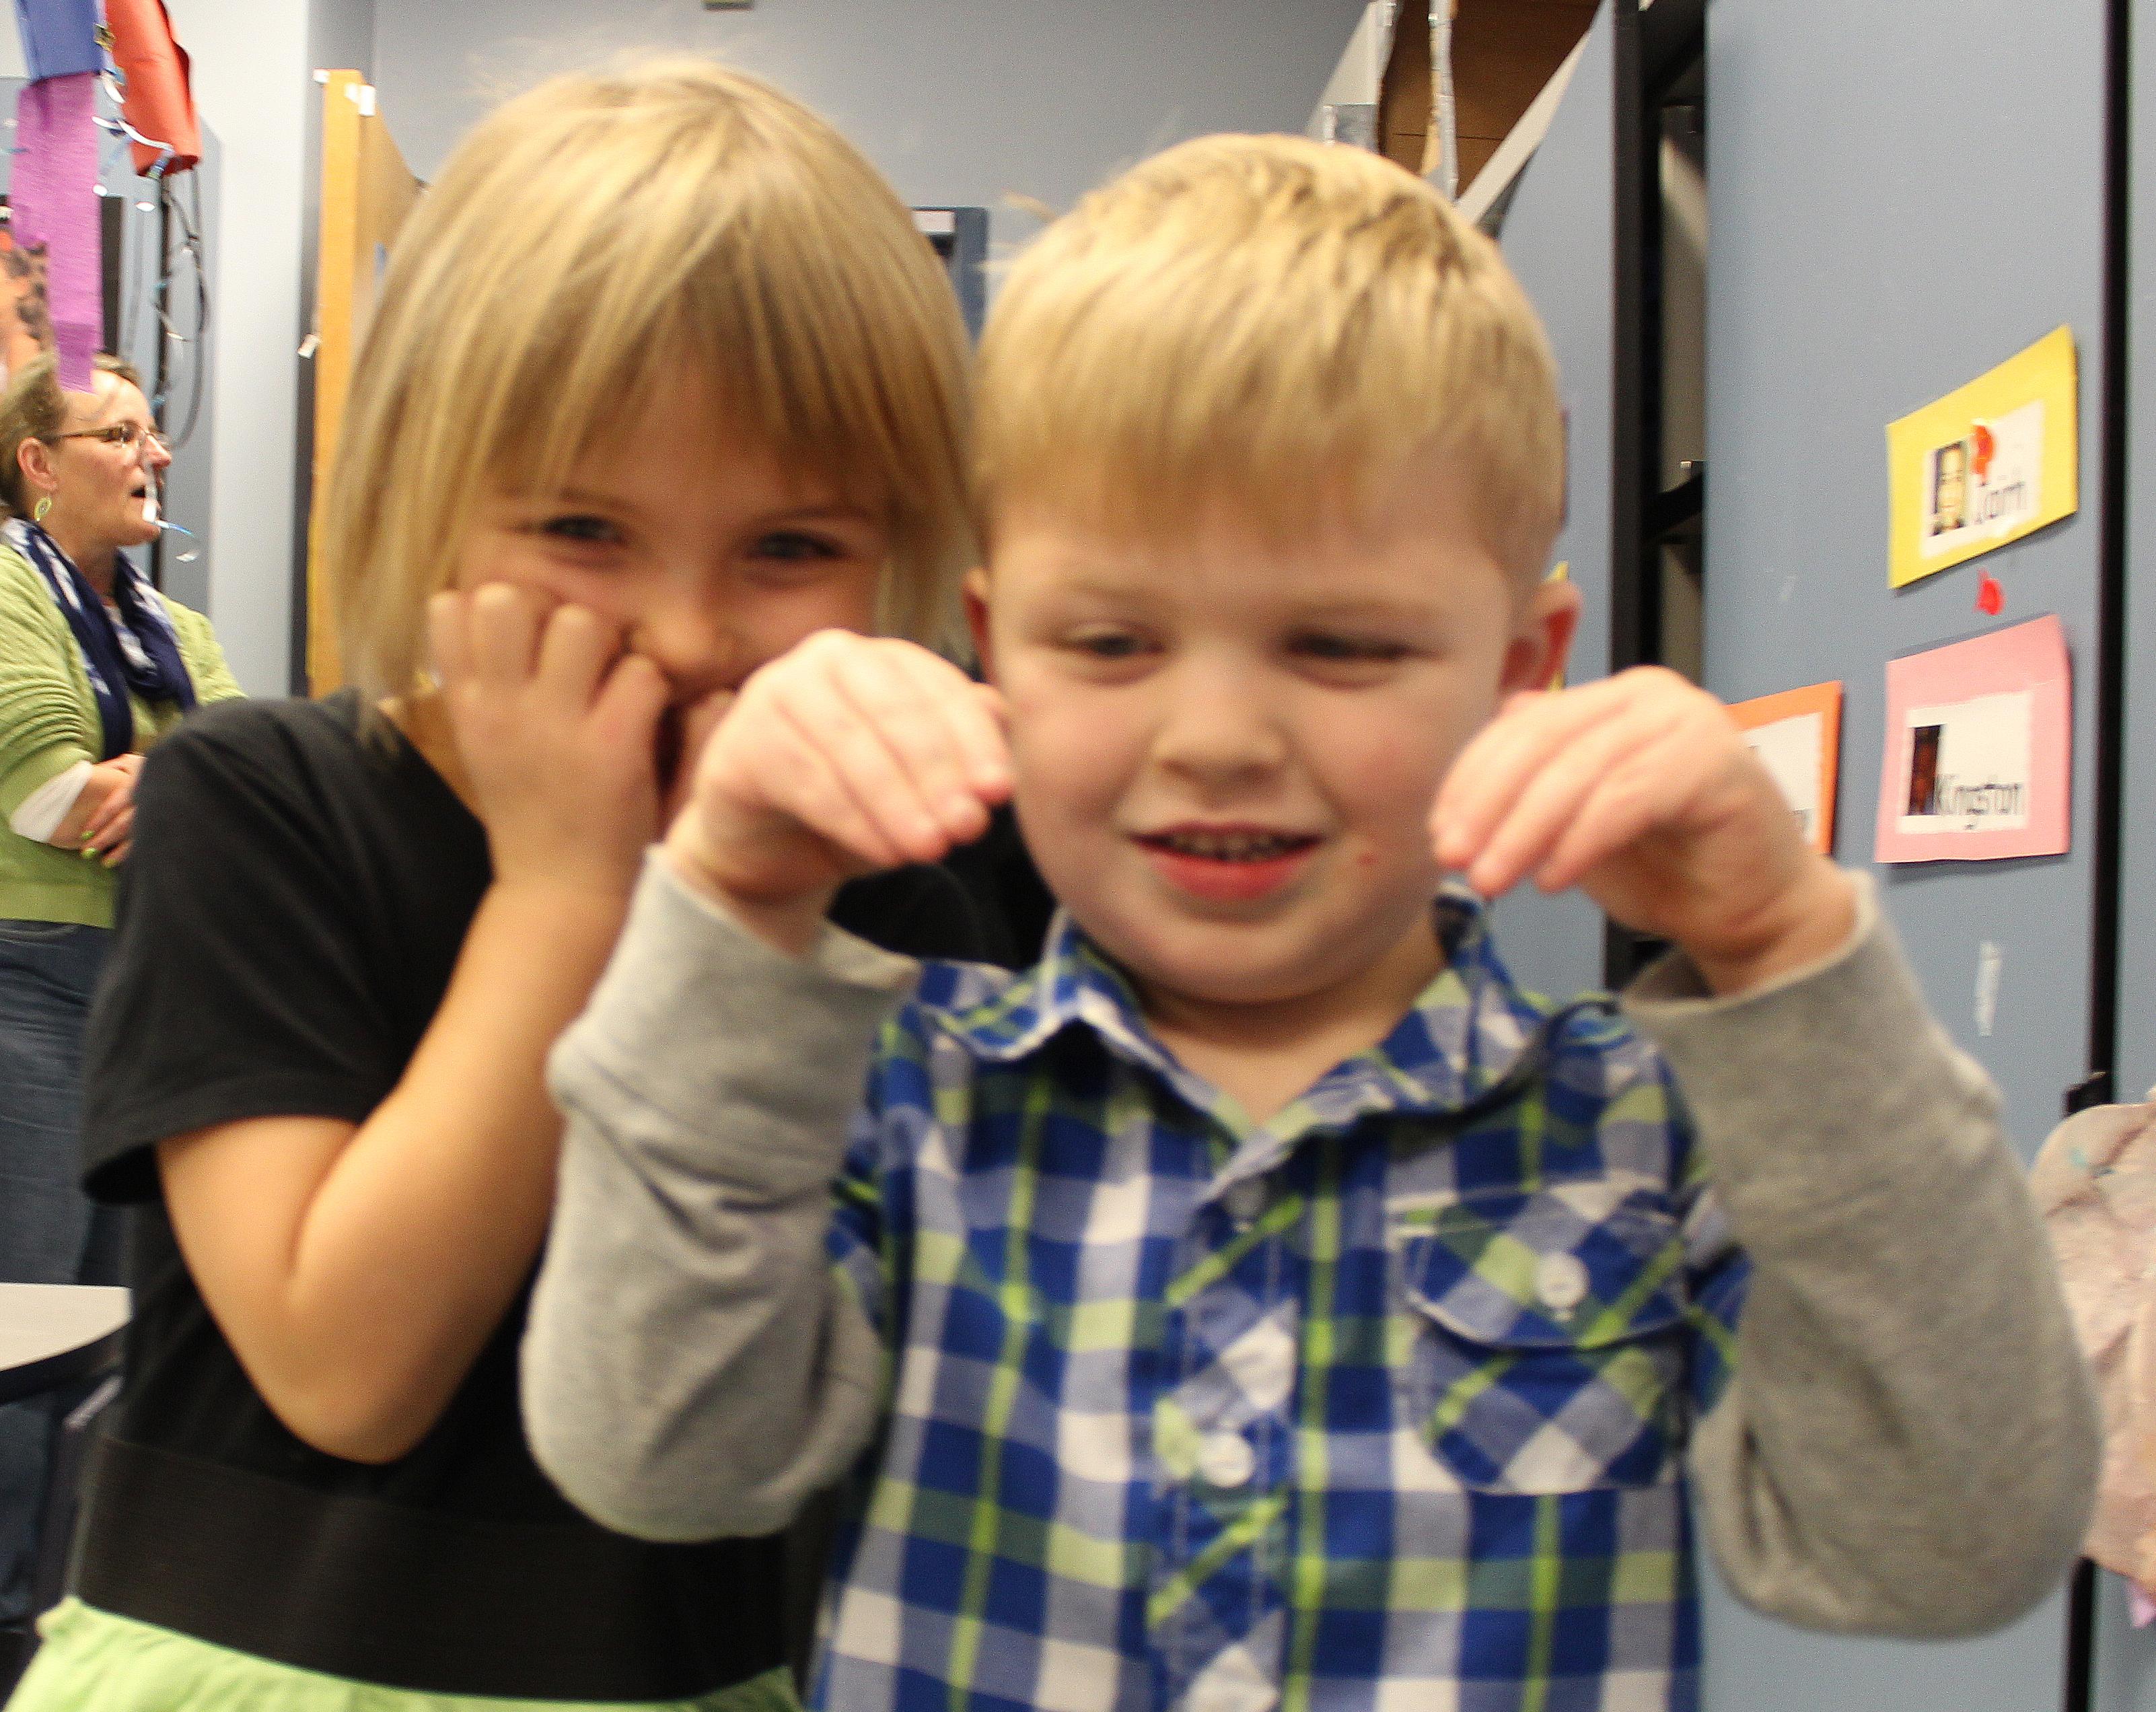 CDSA preschool photos, Association, Community, Day, Elementary, HQ Photo